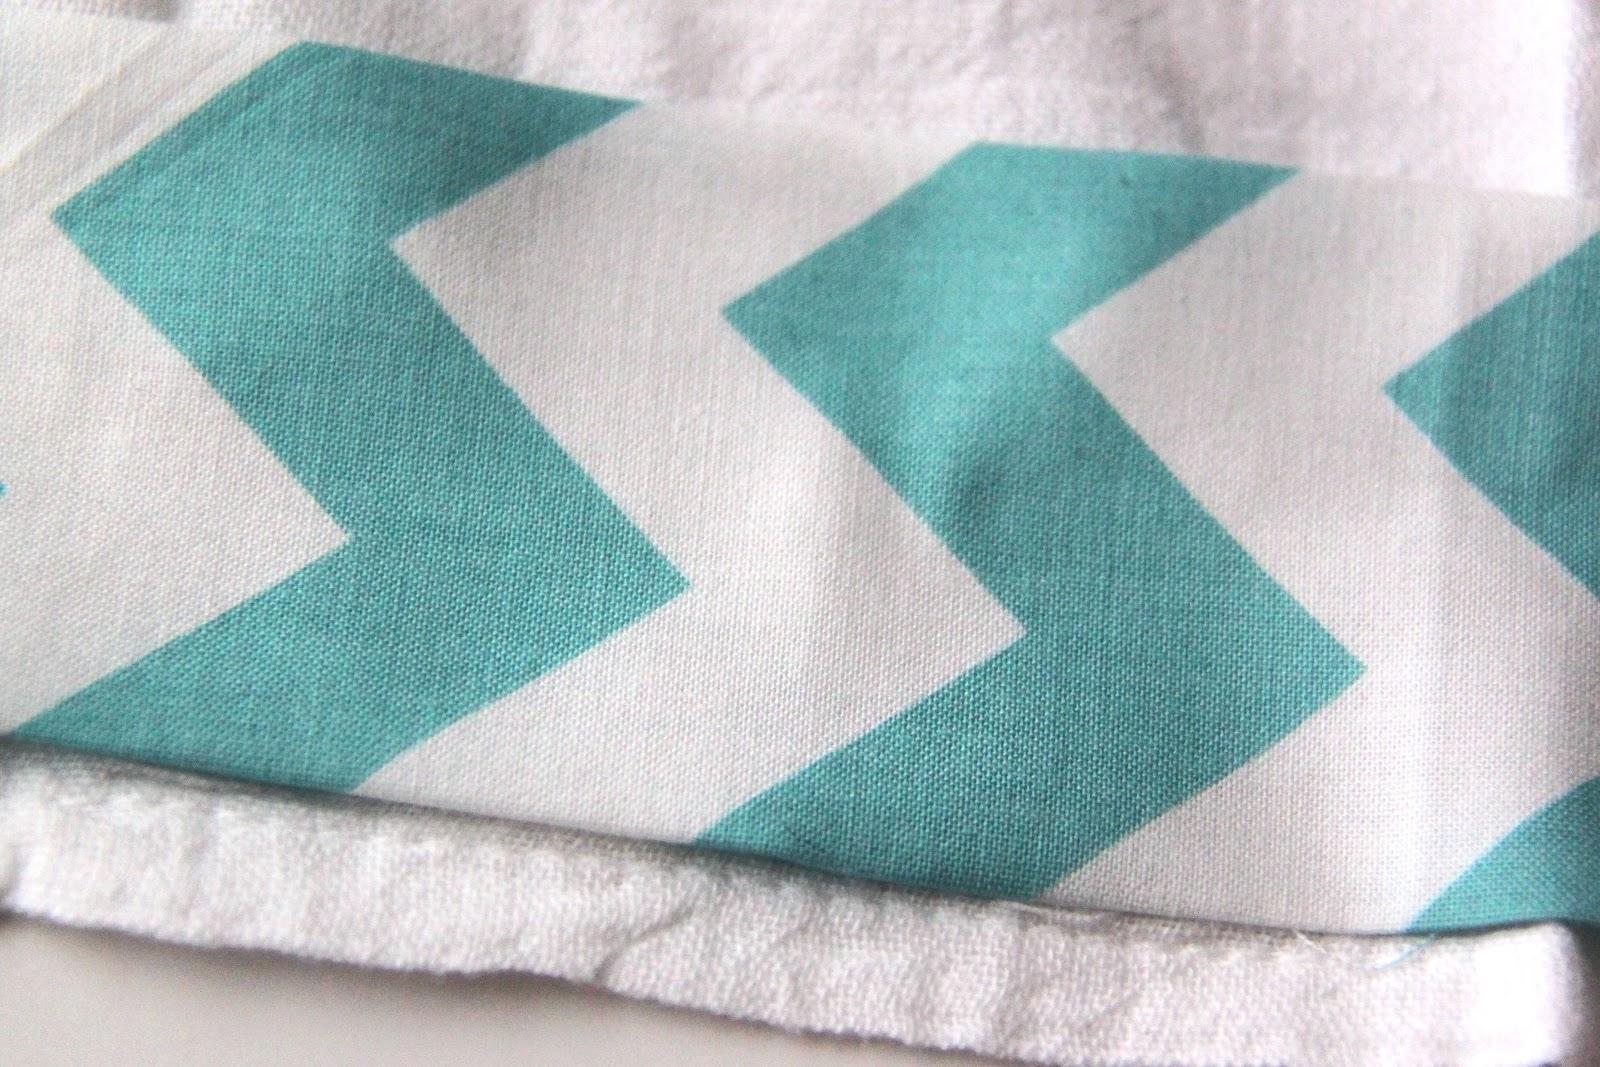 Chevron Inspired Tea Towels-TUTORIAL - Smashed Peas & Carrots